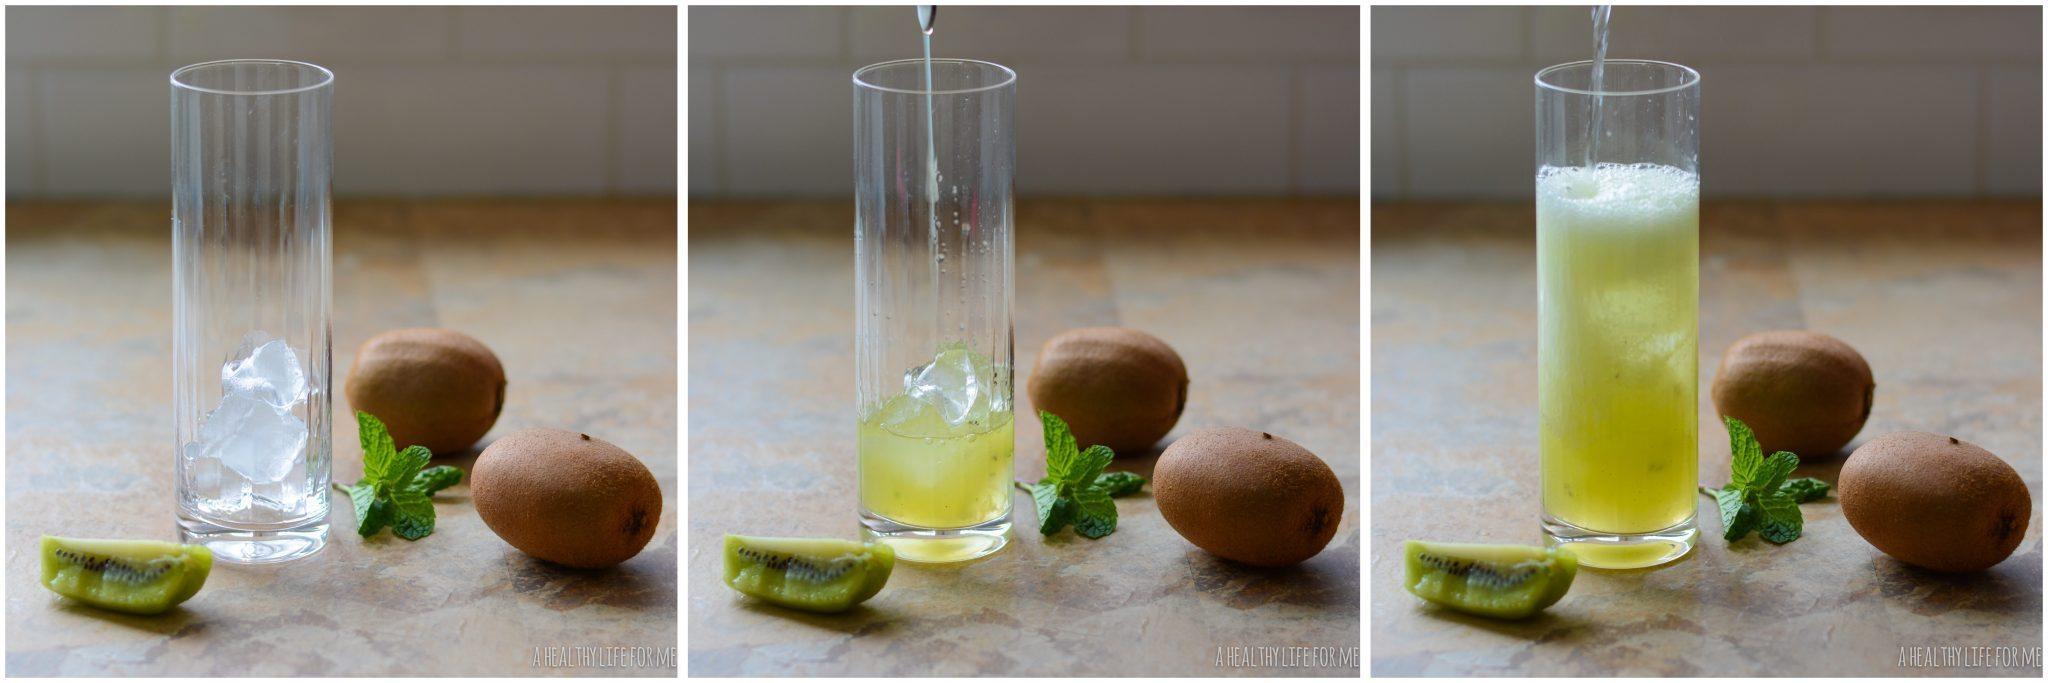 Kiwi fresh cocktail a healthy life for me for Cocktail kiwi